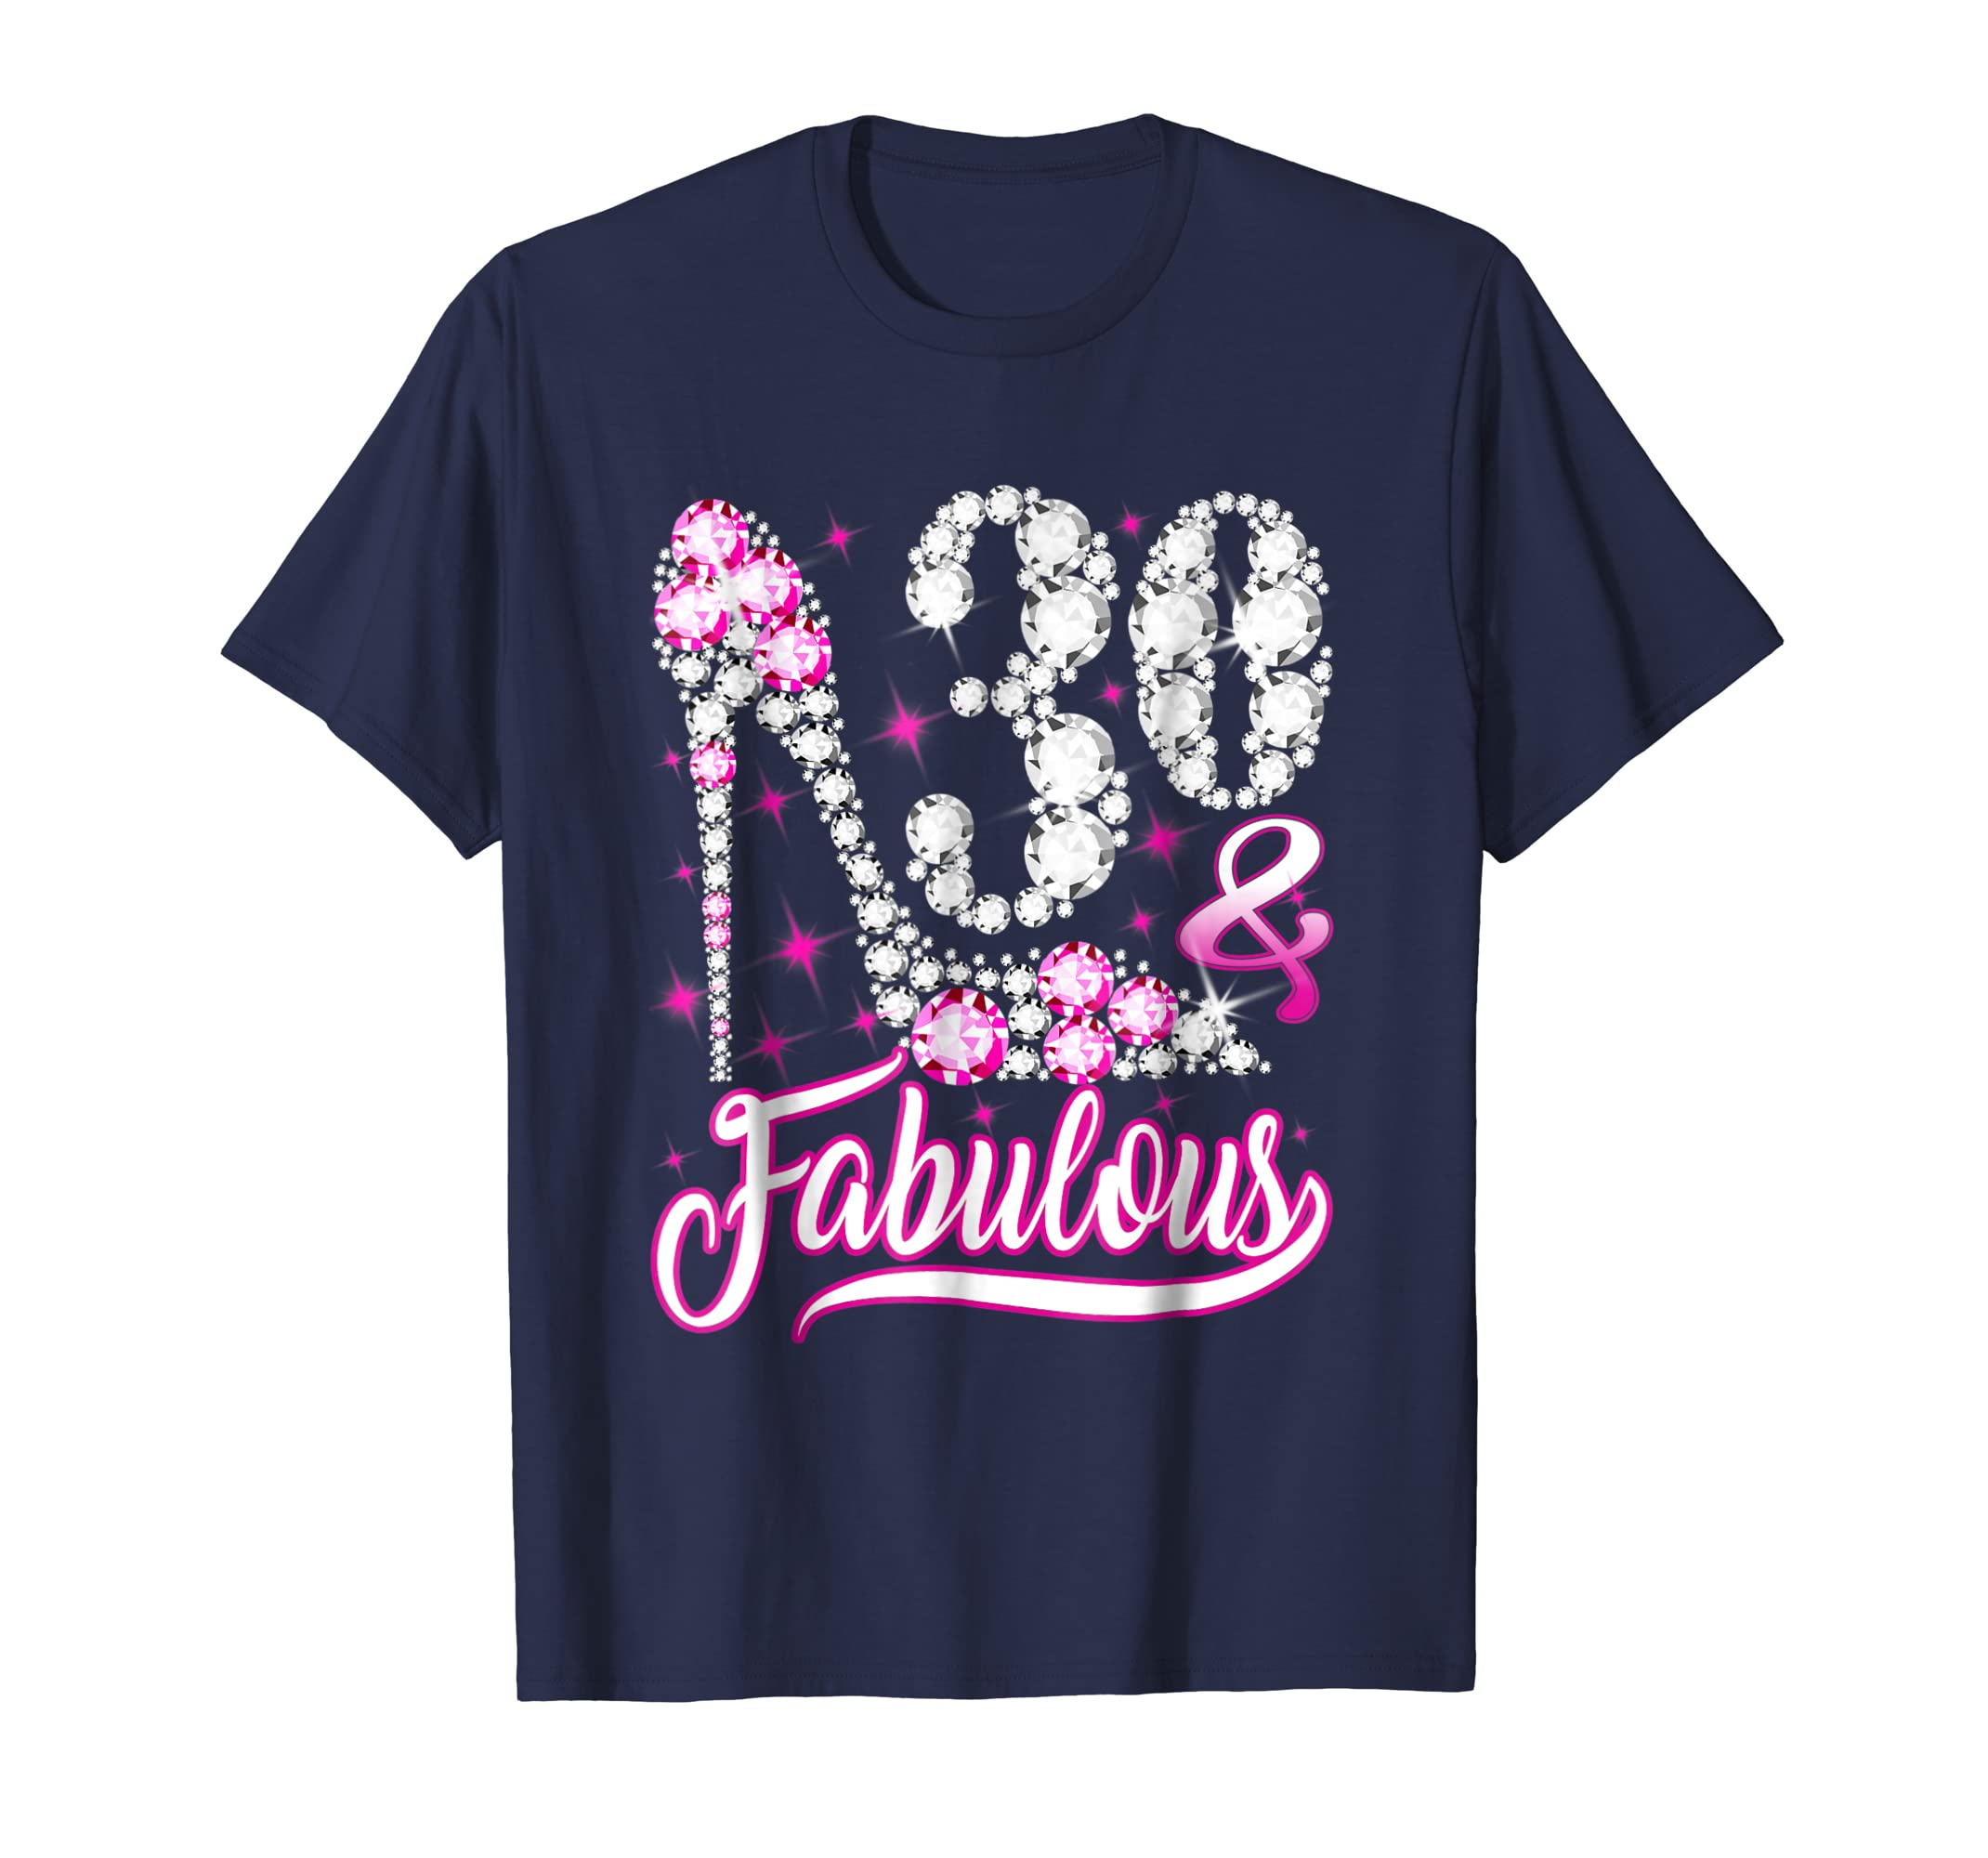 0f440359 Amazon.com: 30 and Fabulous T-Shirt 30th Birthday Gift Women: Clothing